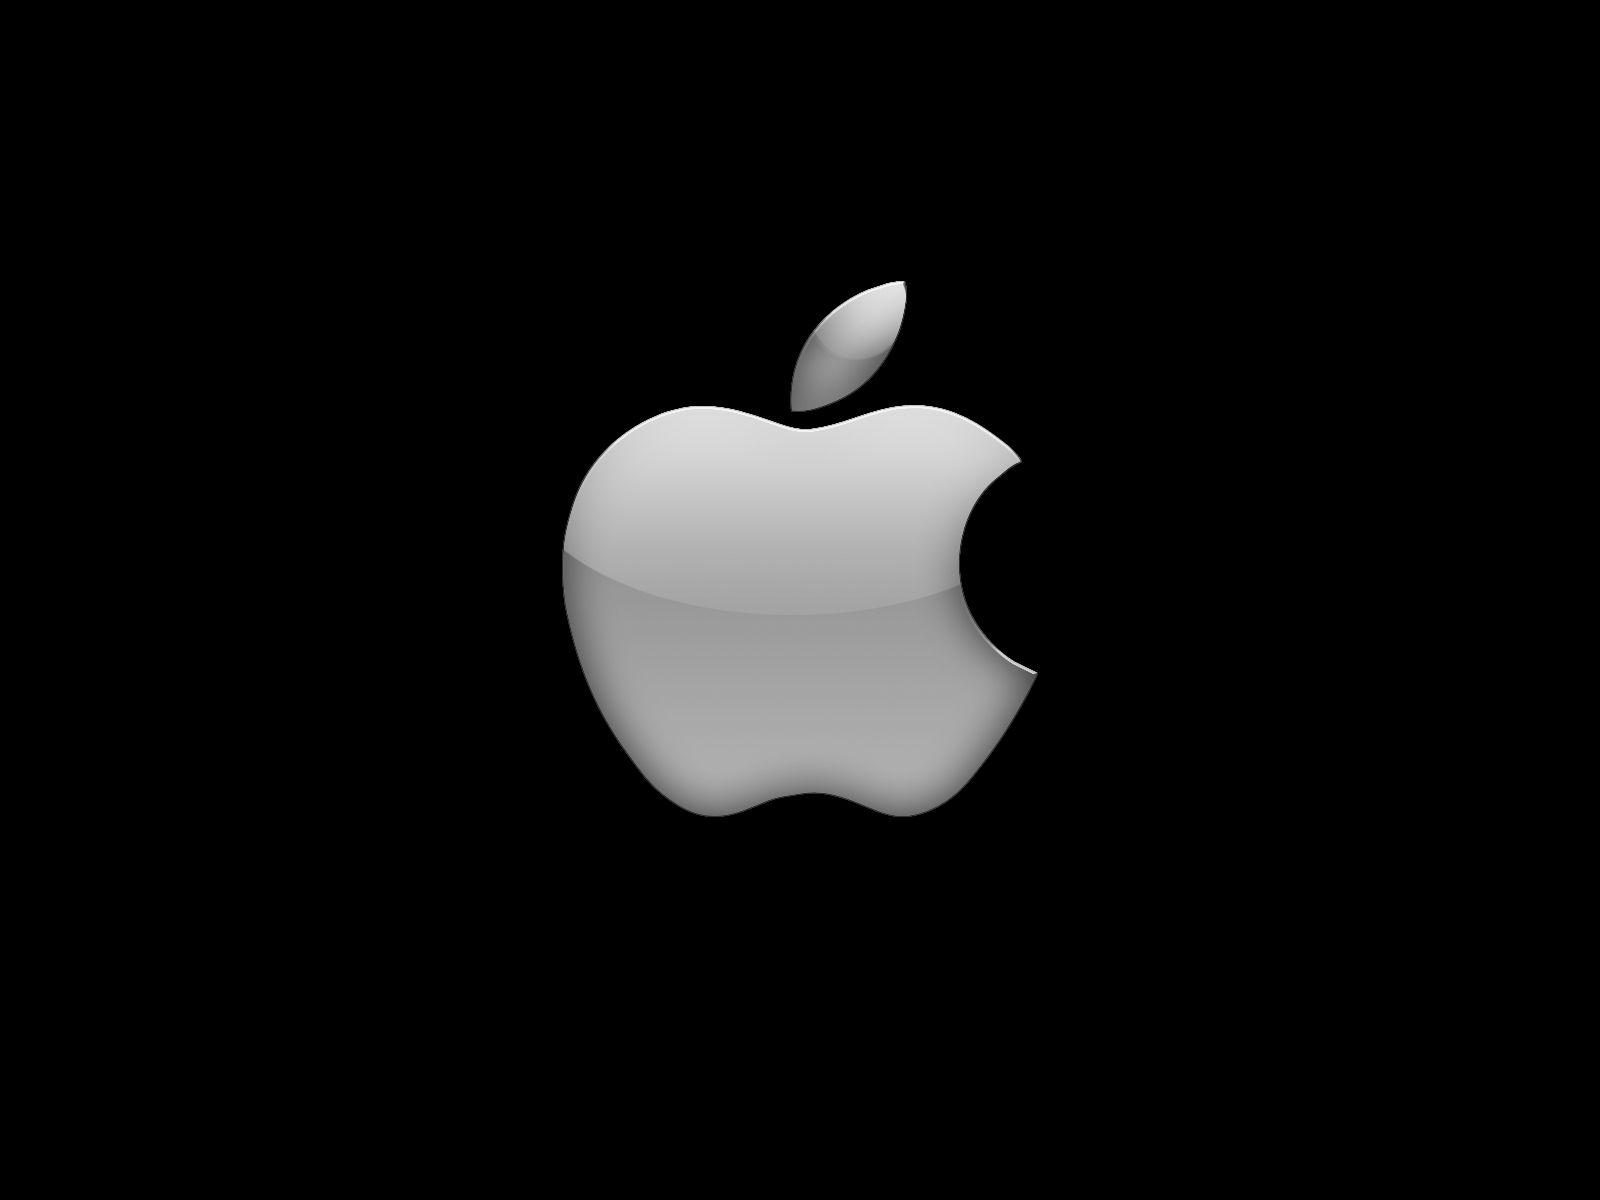 Apple Mac Wallpapers Design Wallpaper Desktops